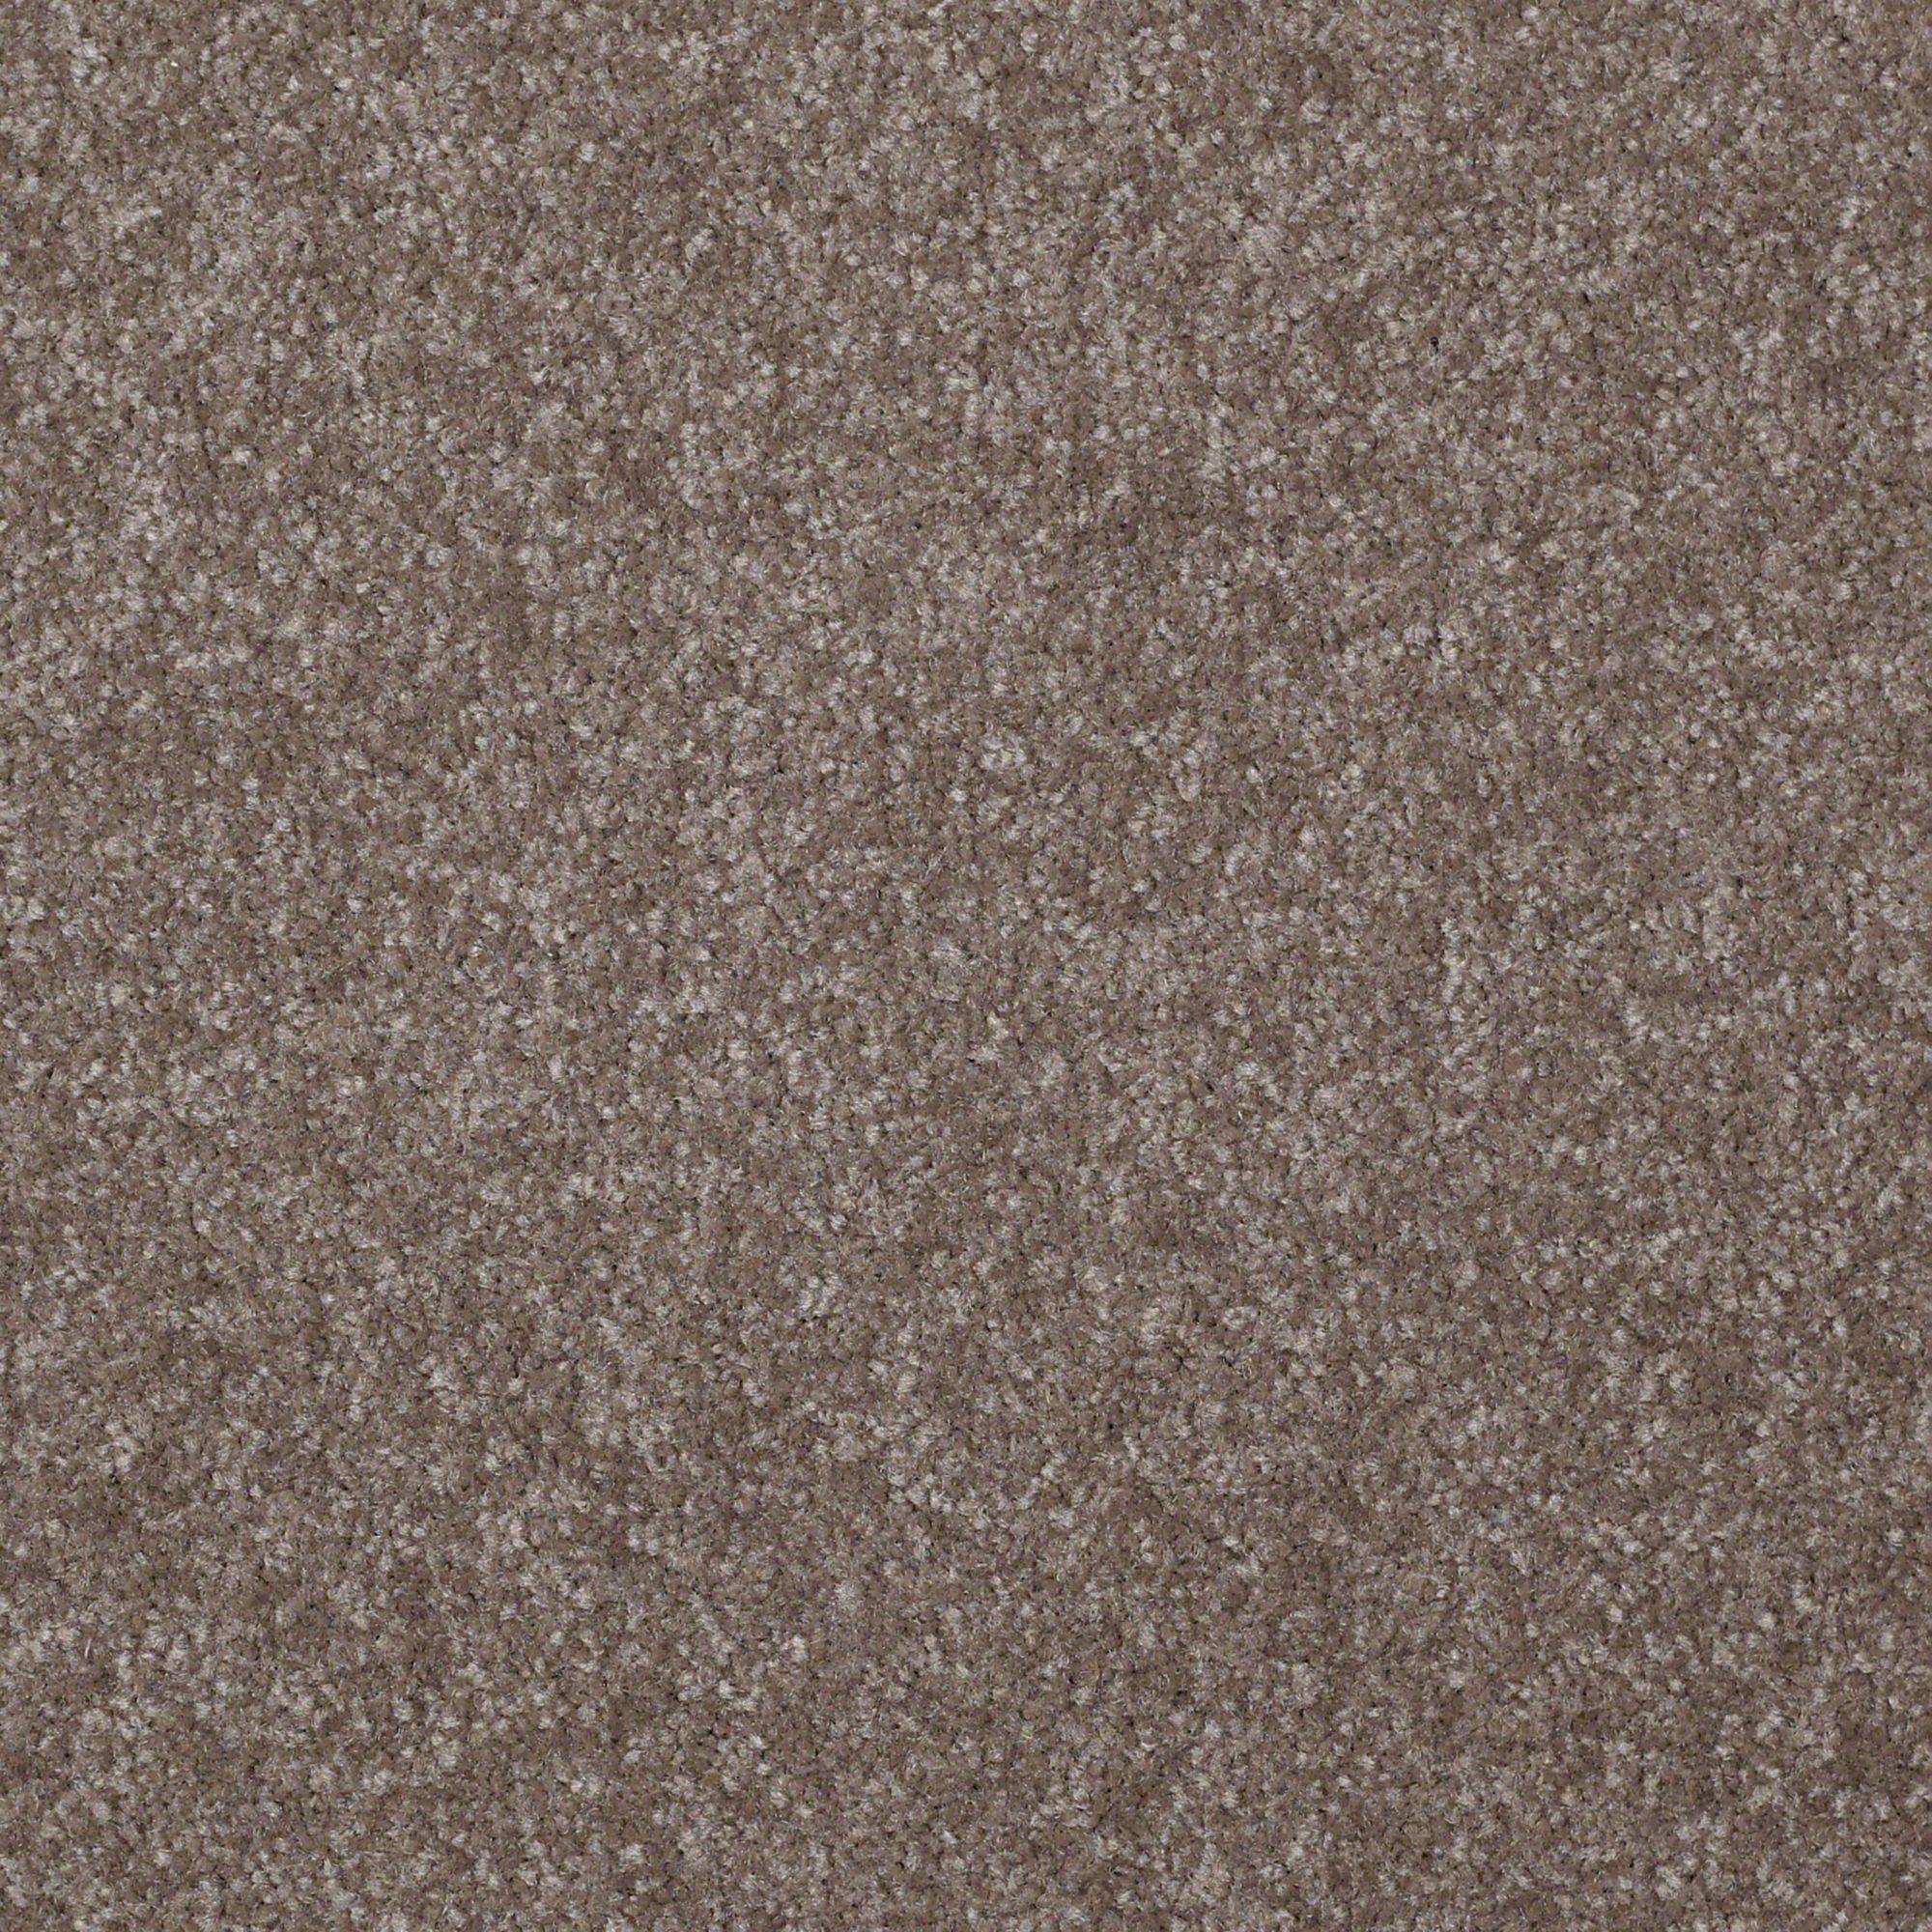 Harborfields Ii 15 Carpet Samples Bedroom Carpet Colors Diy Carpet